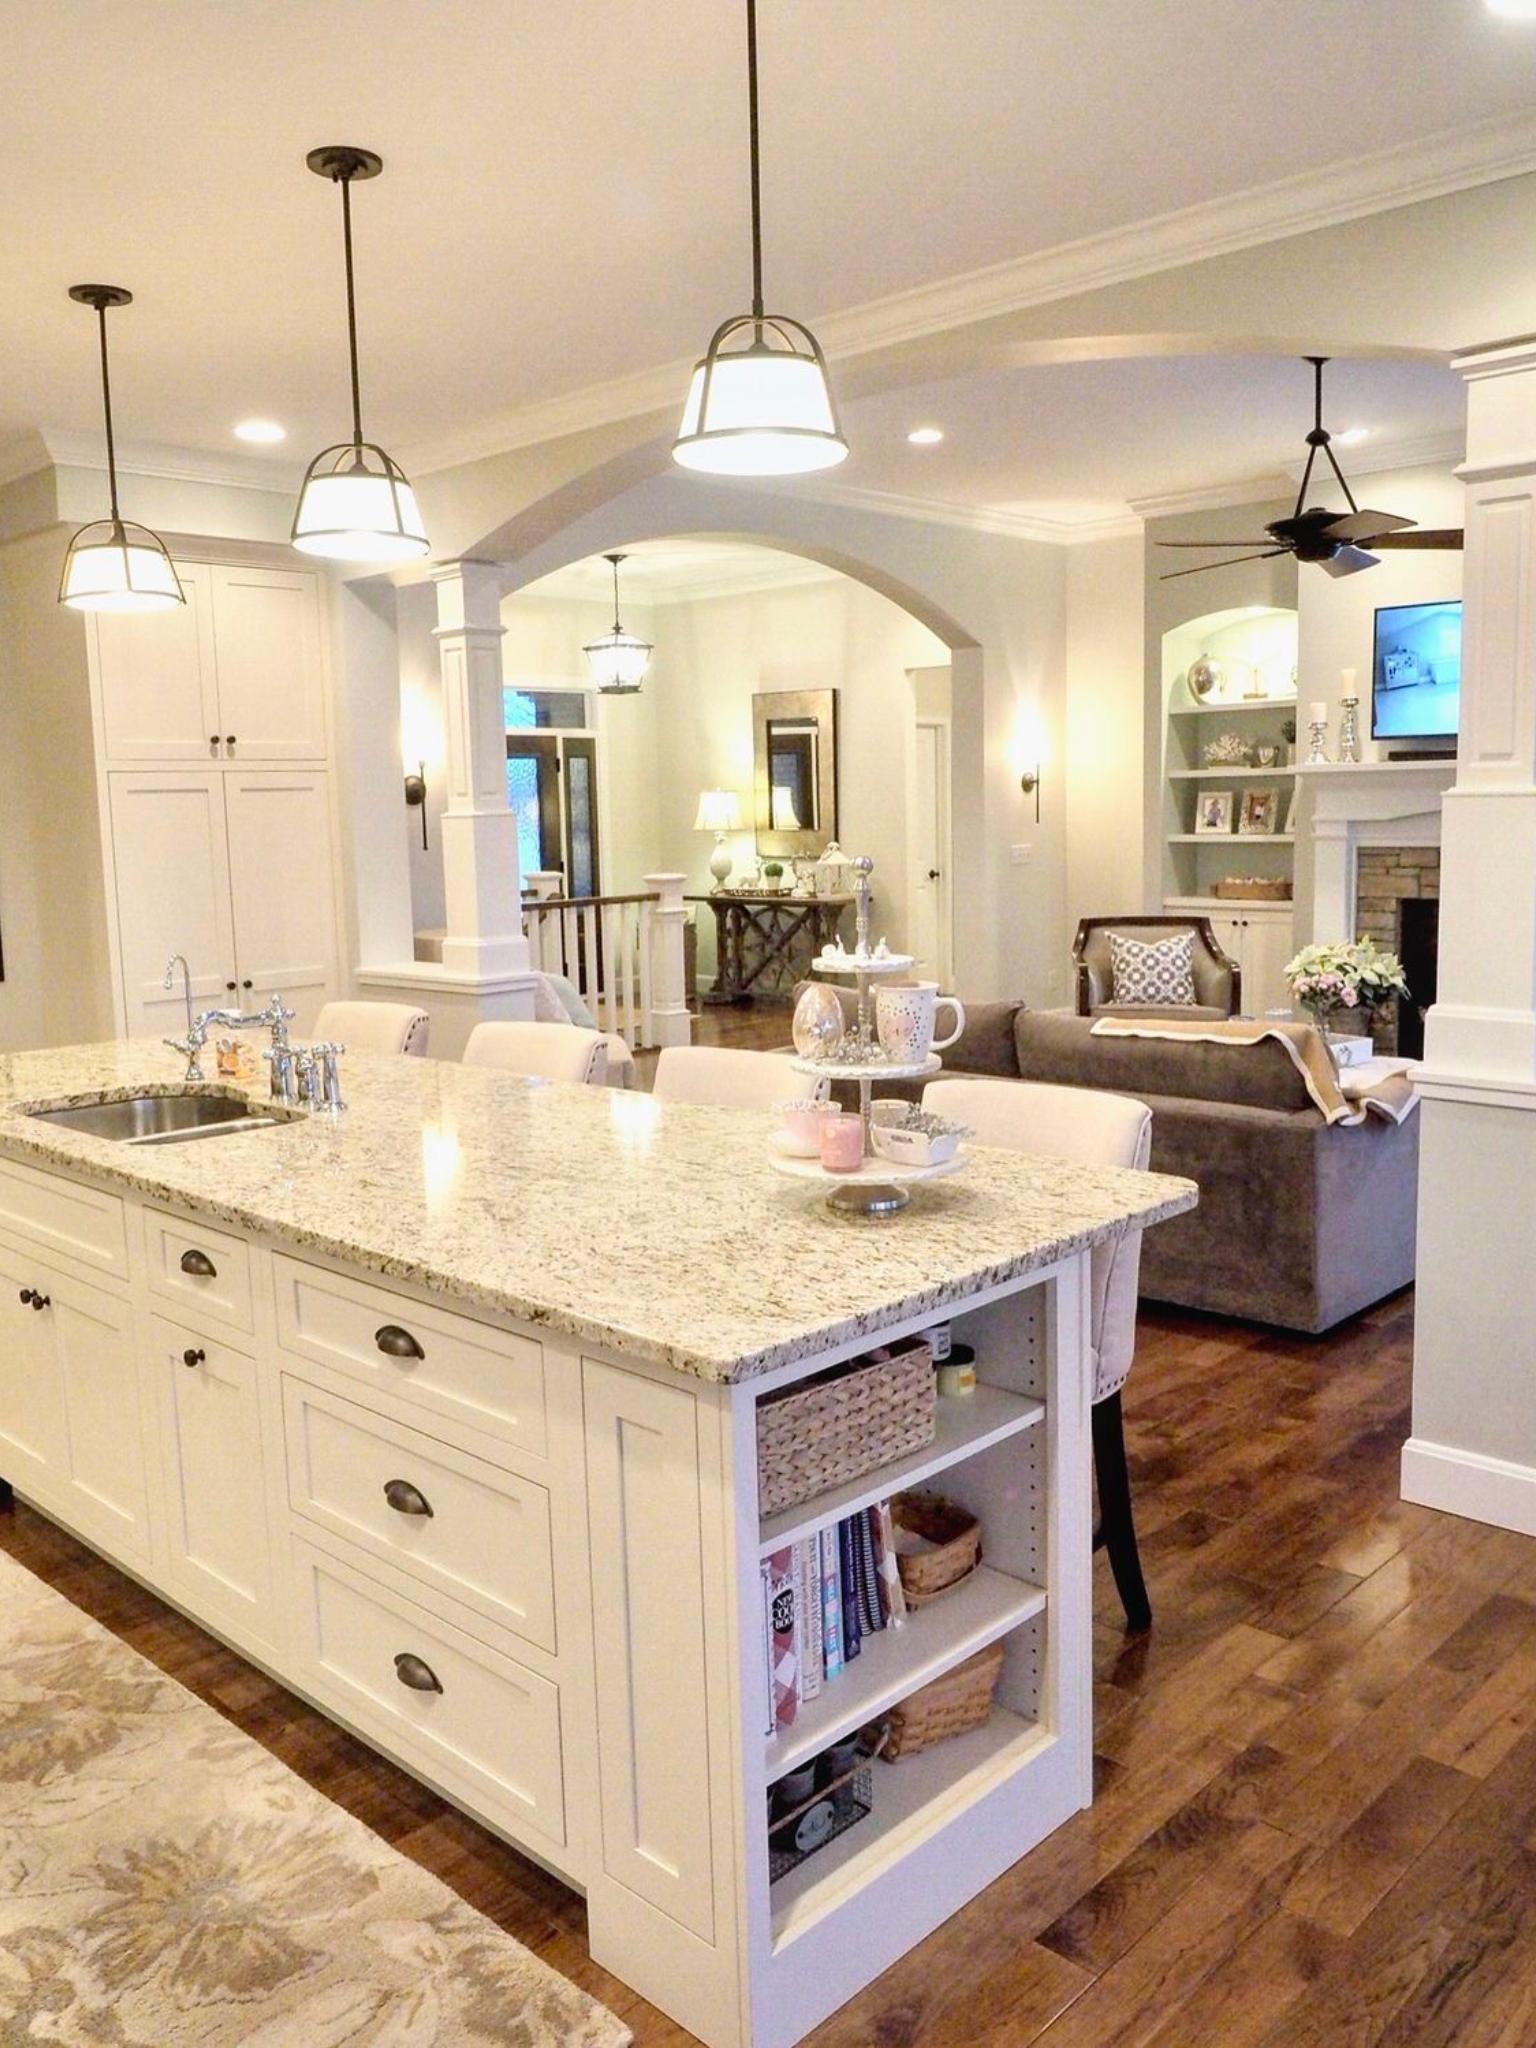 white kitchen, off-white cabinets, sherwin williams conservative